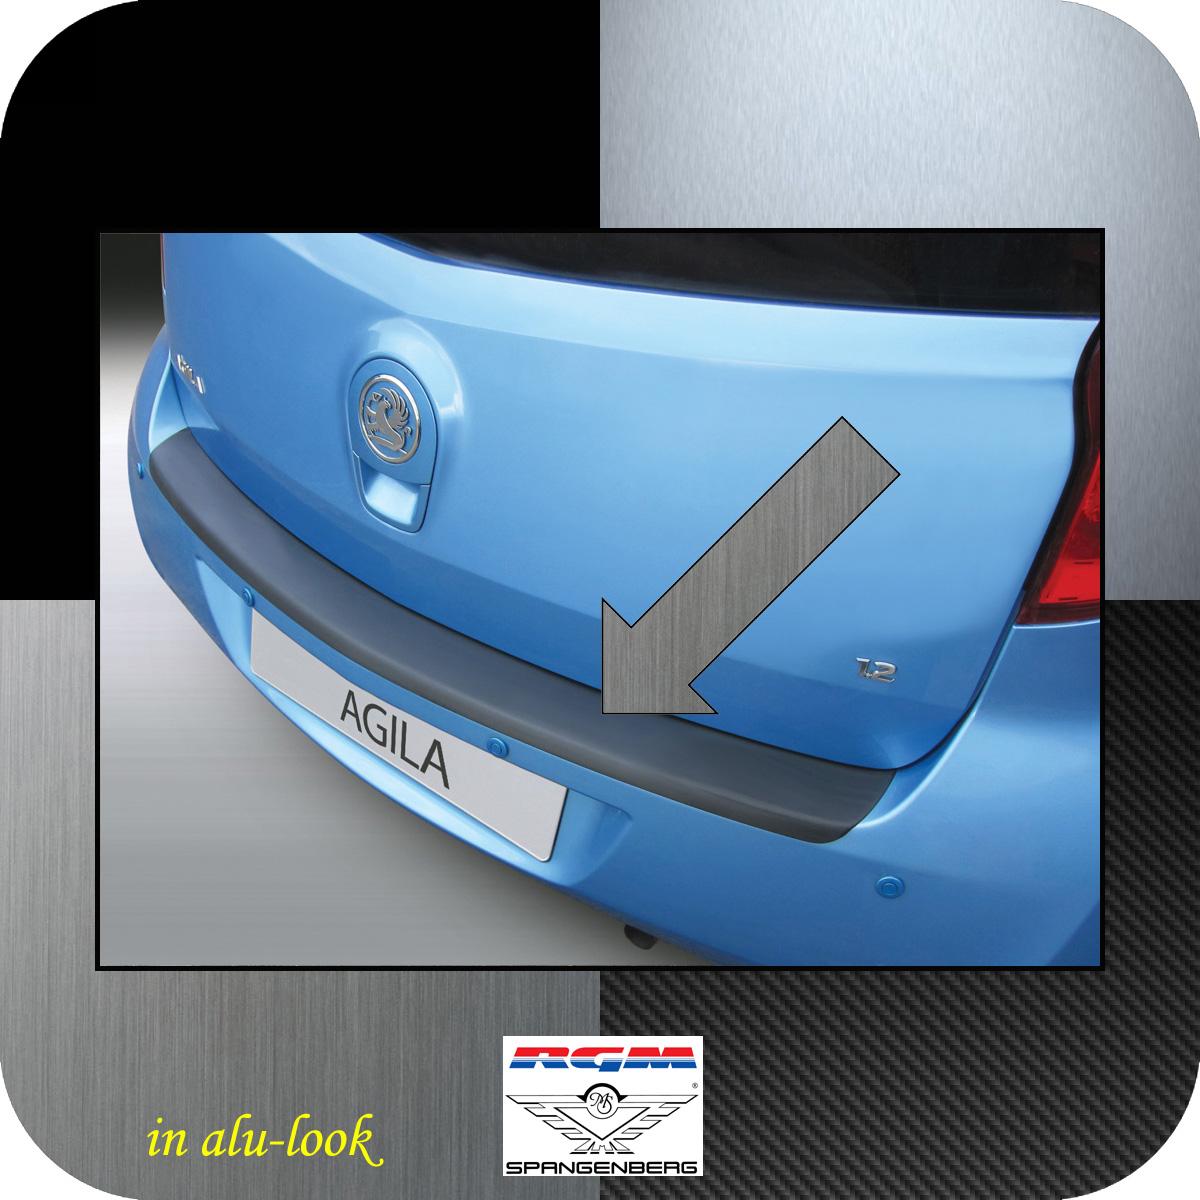 Ladekantenschutz Alu-Look Opel Agila B Minivan Baujahre 03.2008-06.2015 3504994